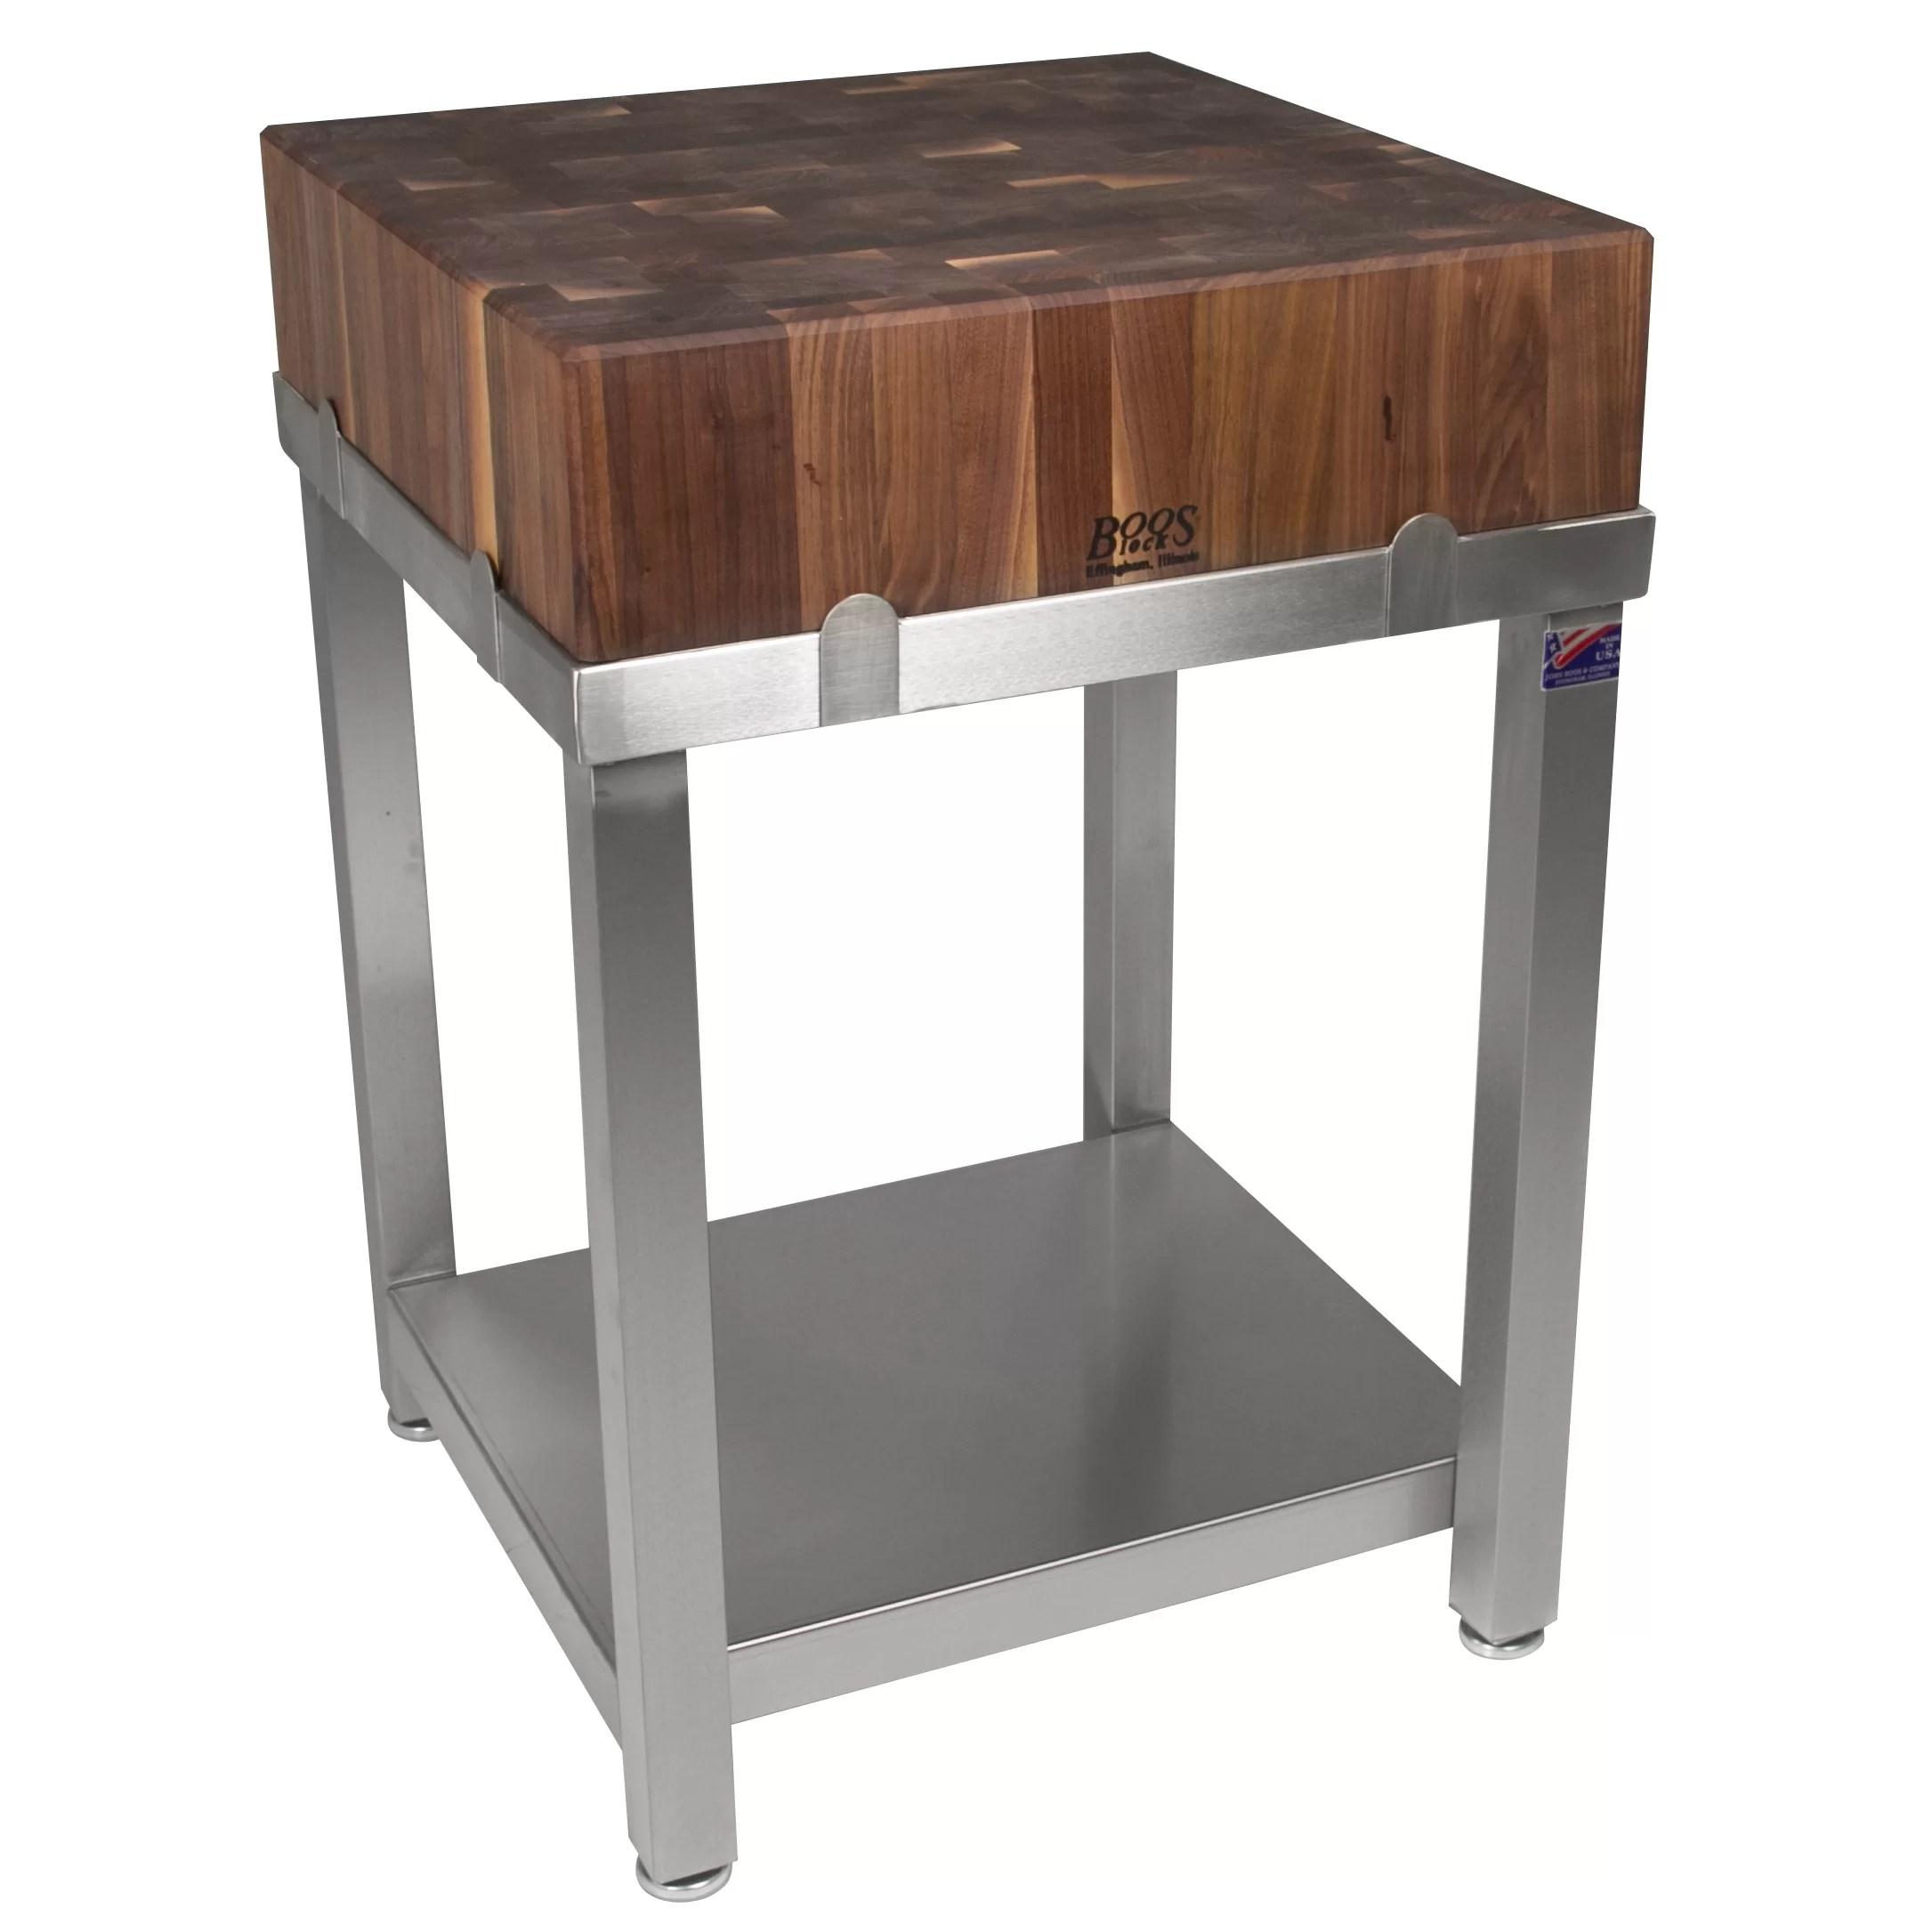 john boos kitchen islands bench seating cucina americana laforza prep table and reviews